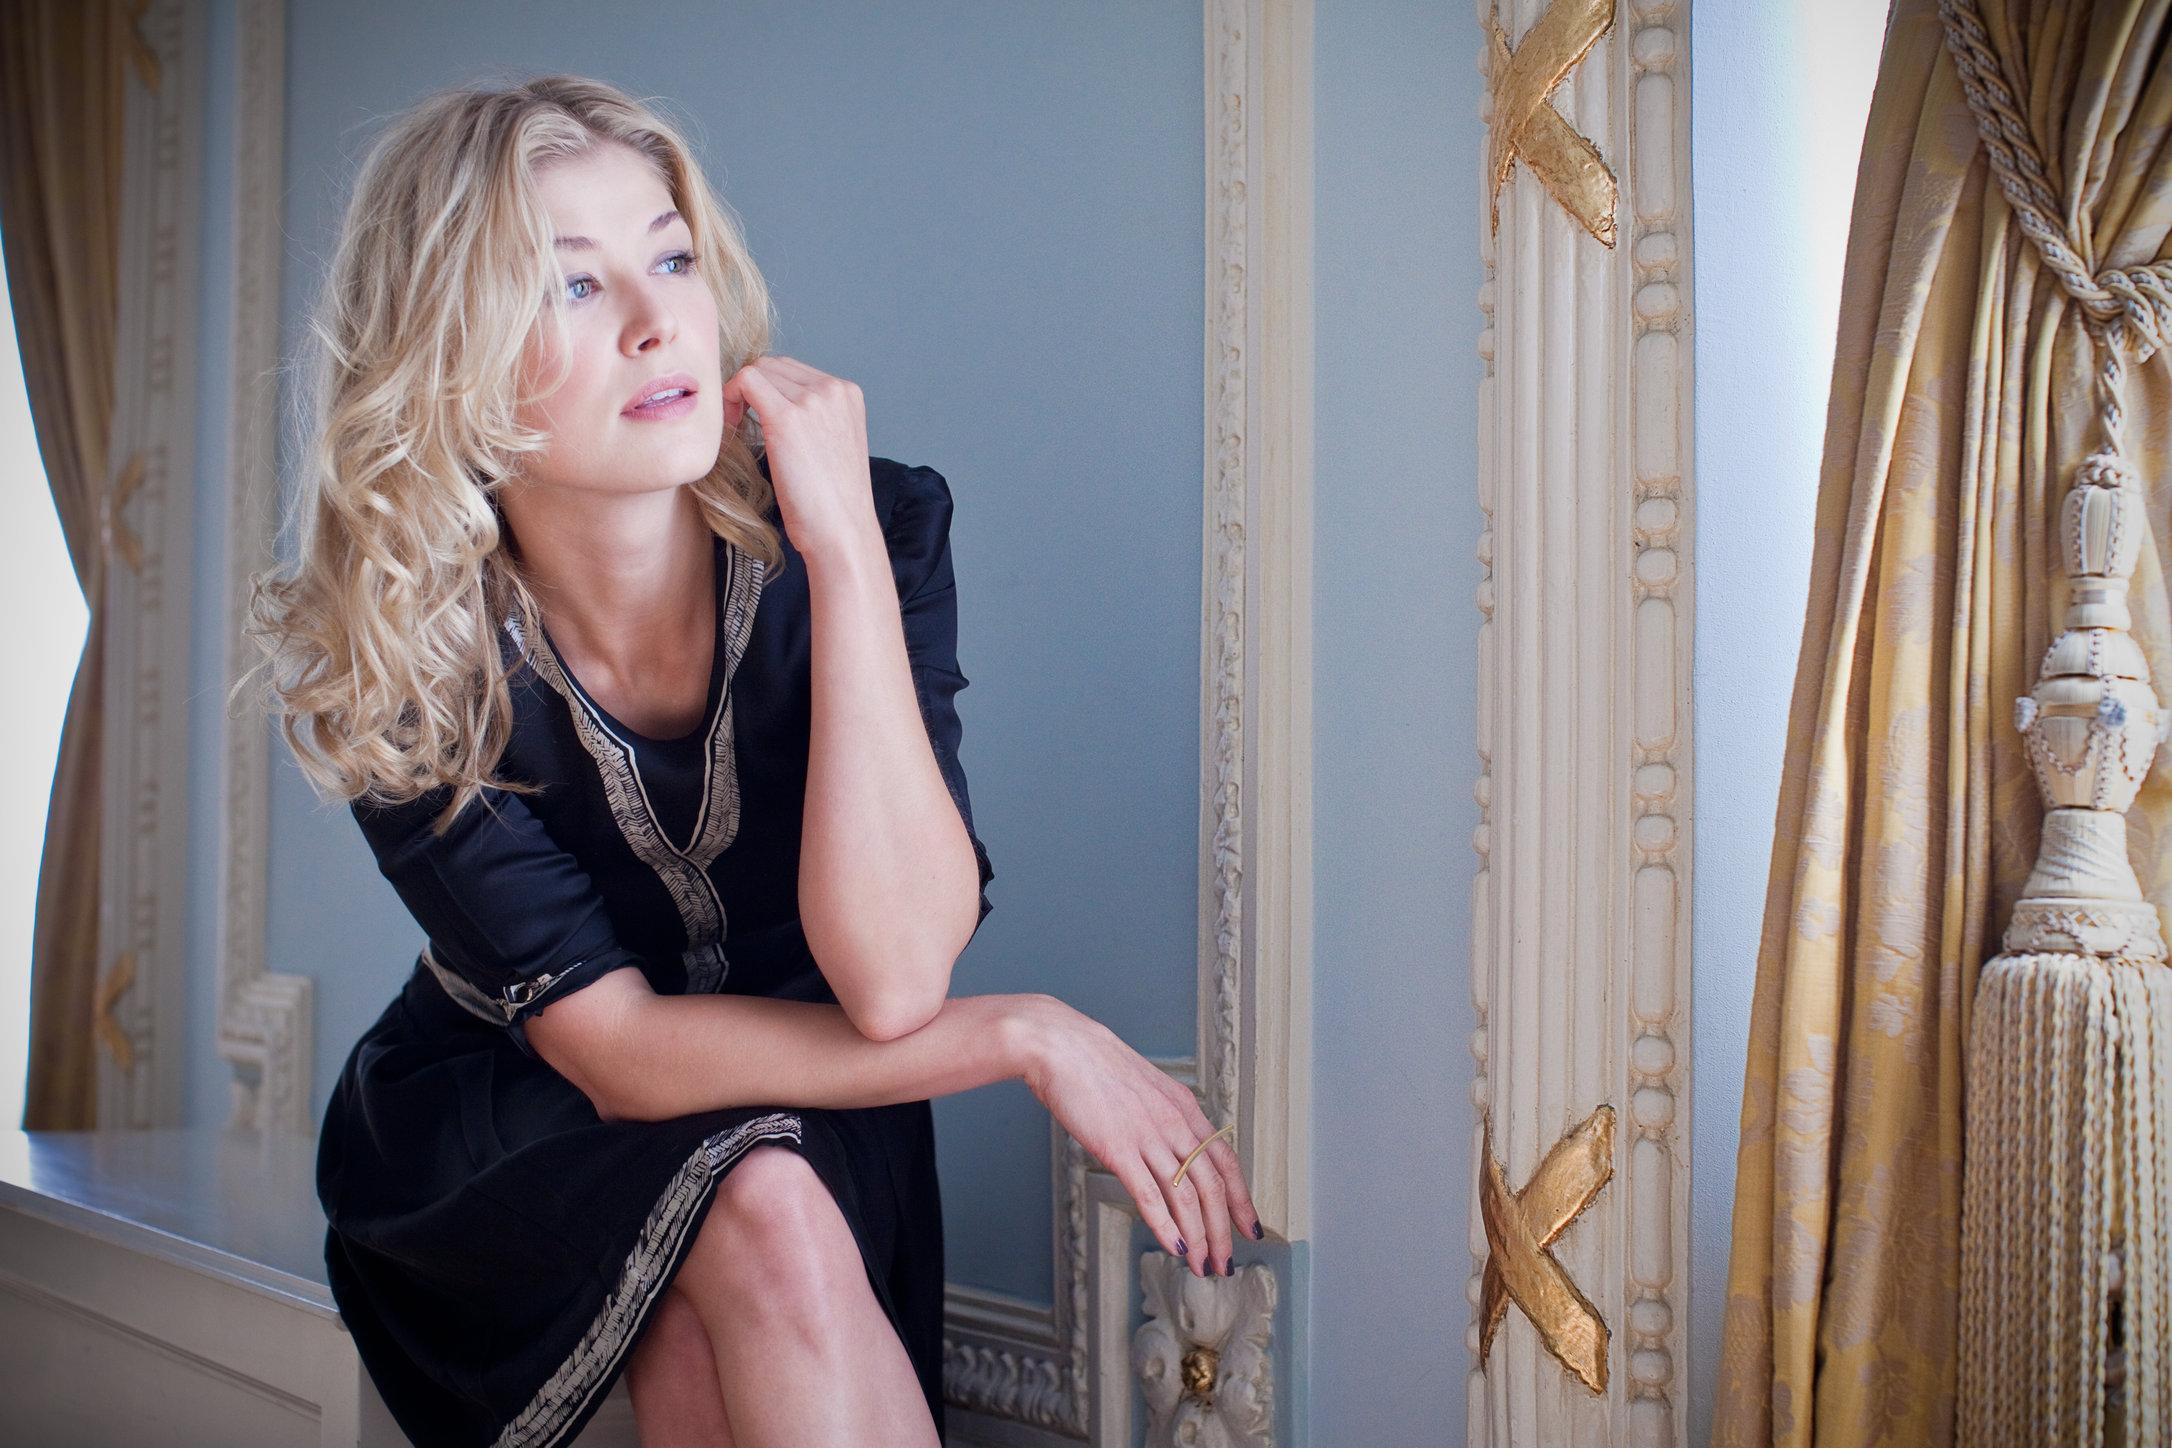 rosamund pike, actress